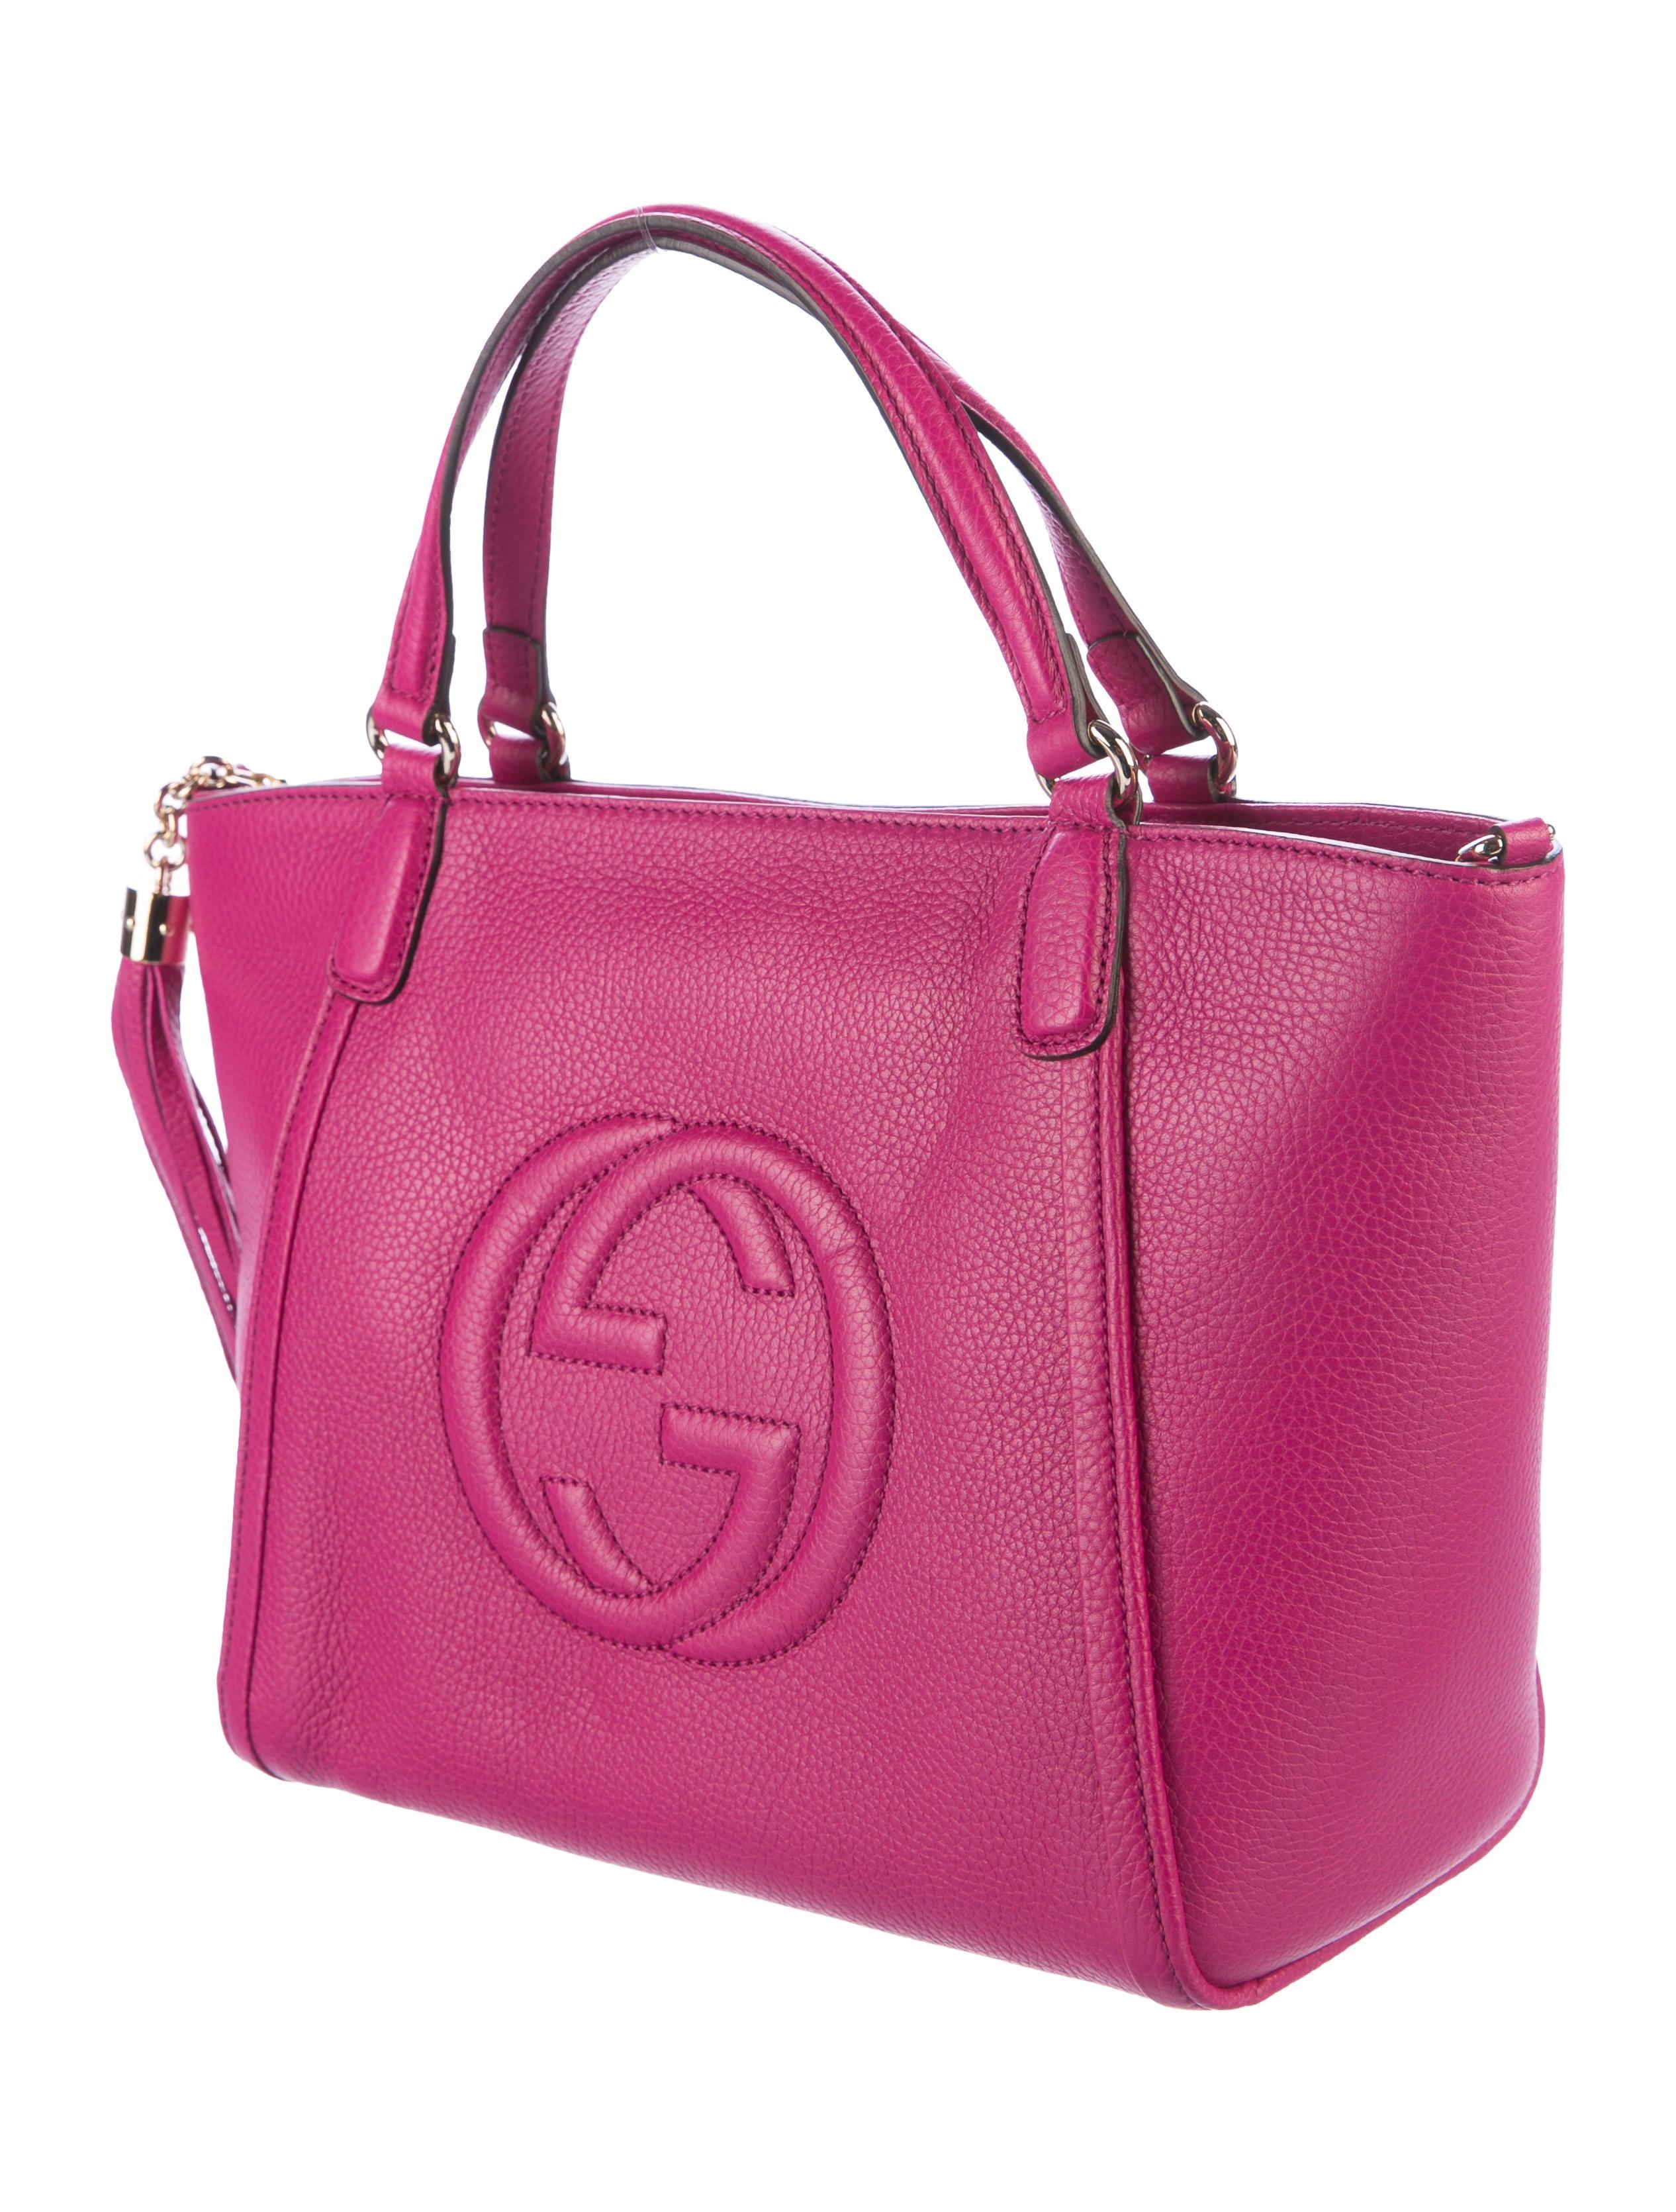 2657d0283 Gucci Handbag Soho Cellarius   Stanford Center for Opportunity ...